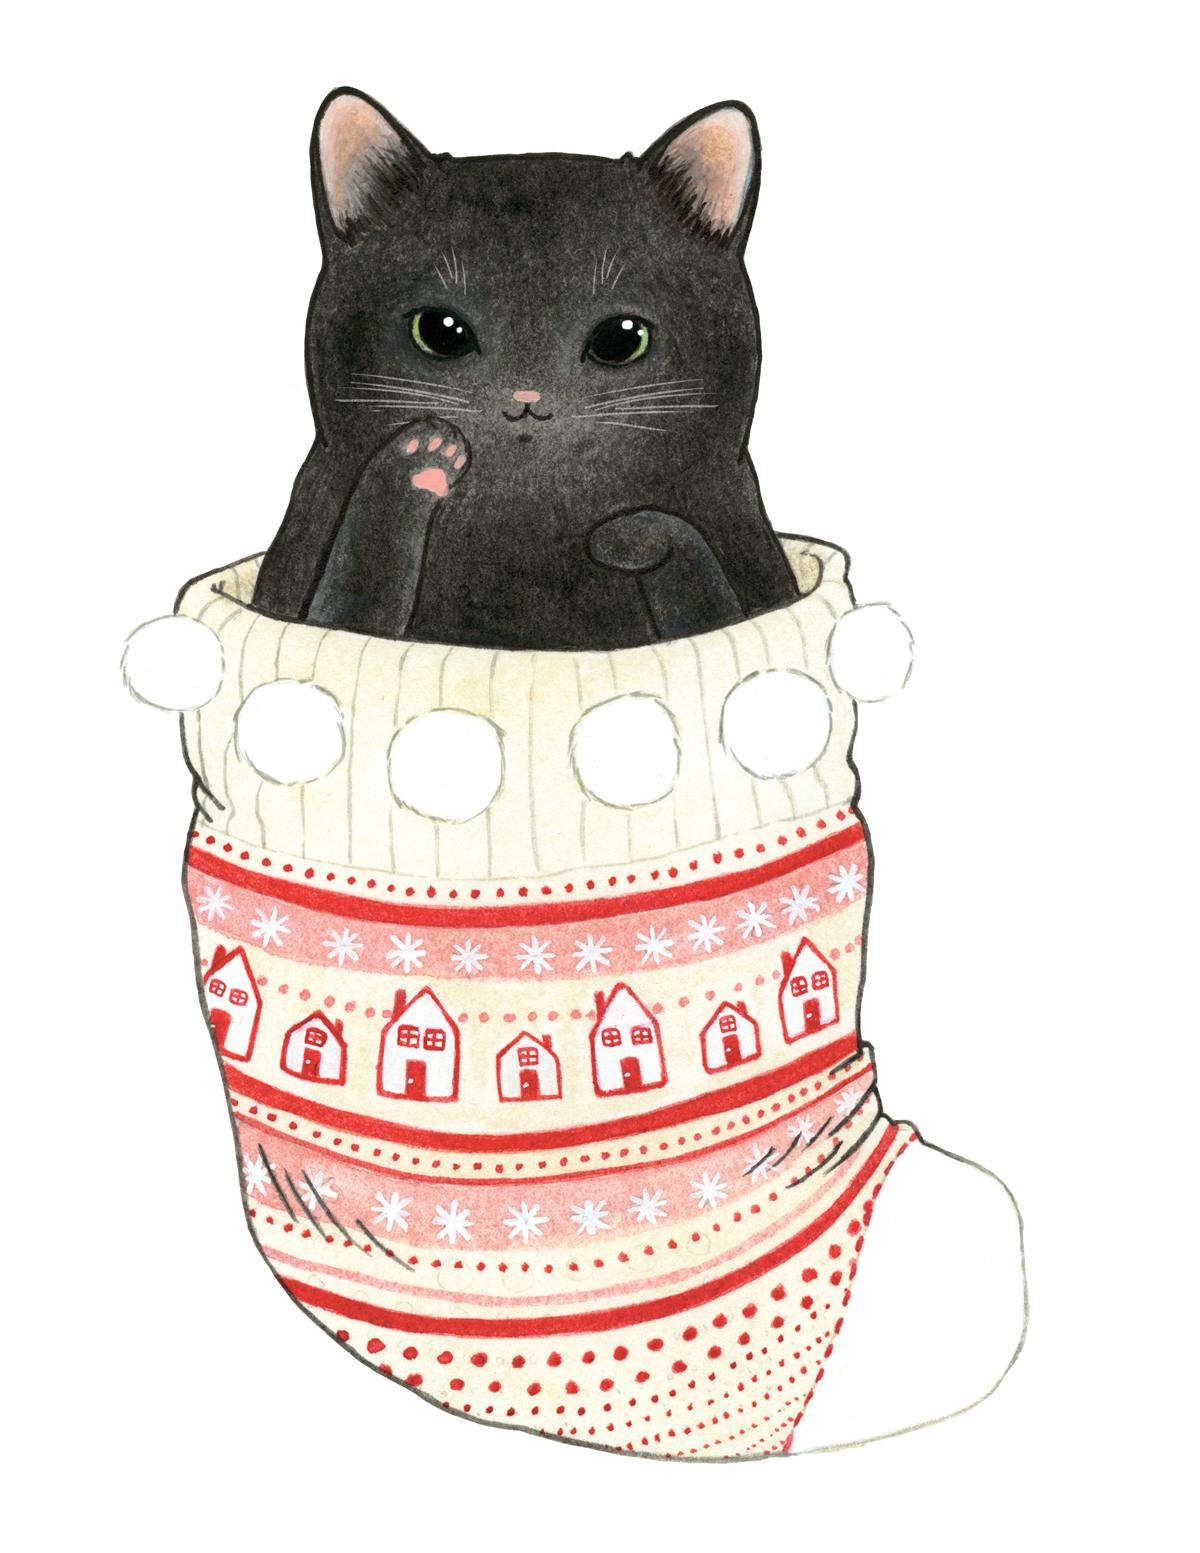 Black Cat in a Stocking